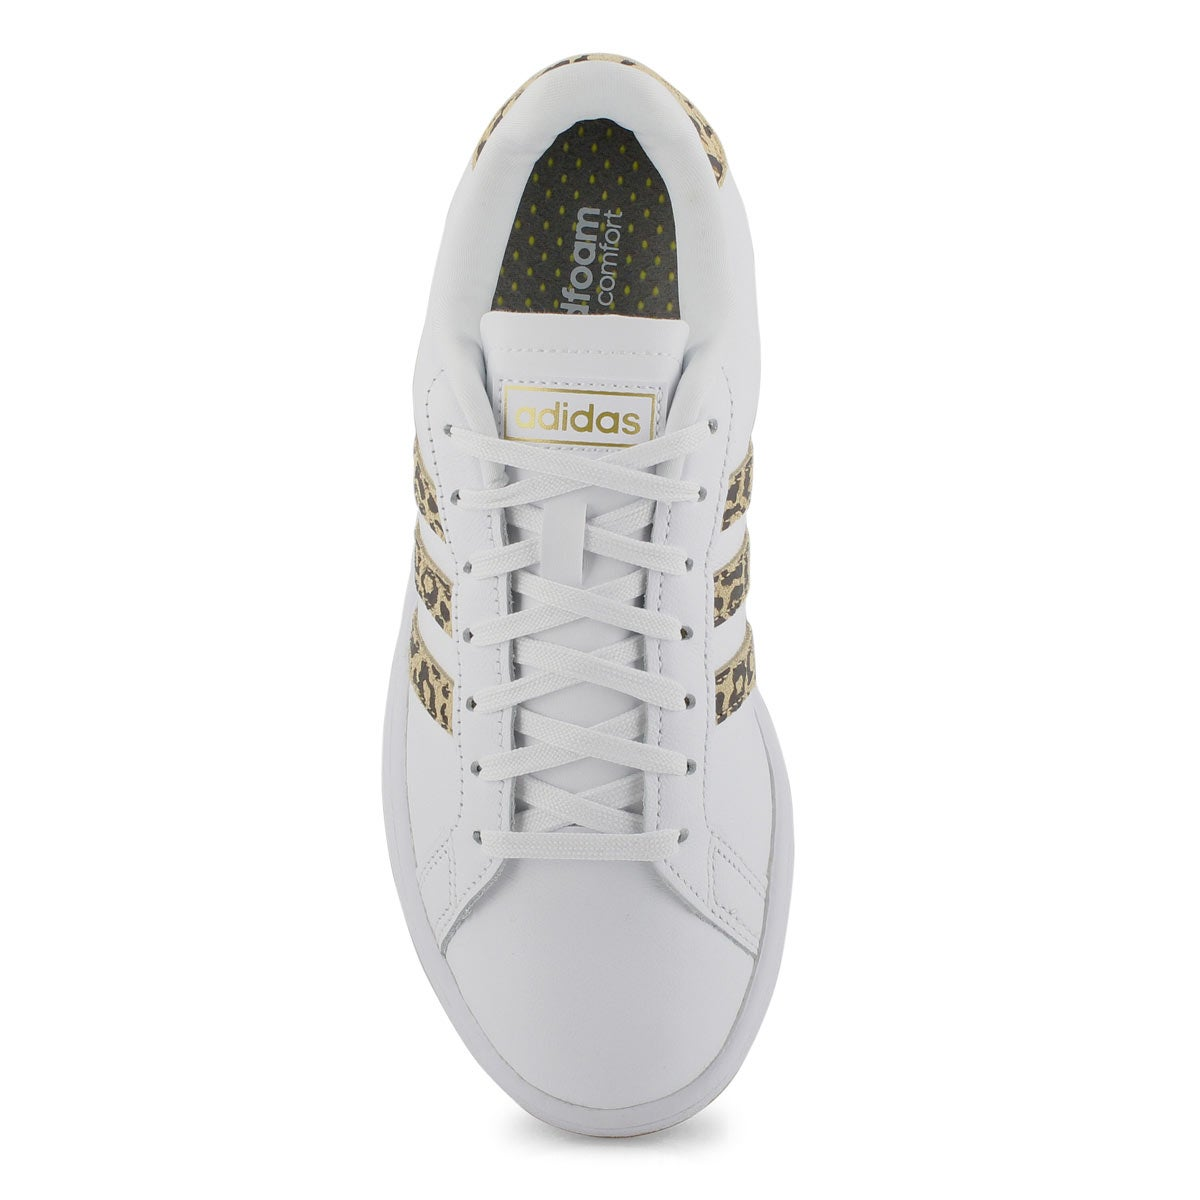 Women's Grand Court Sneaker - White/Leopard